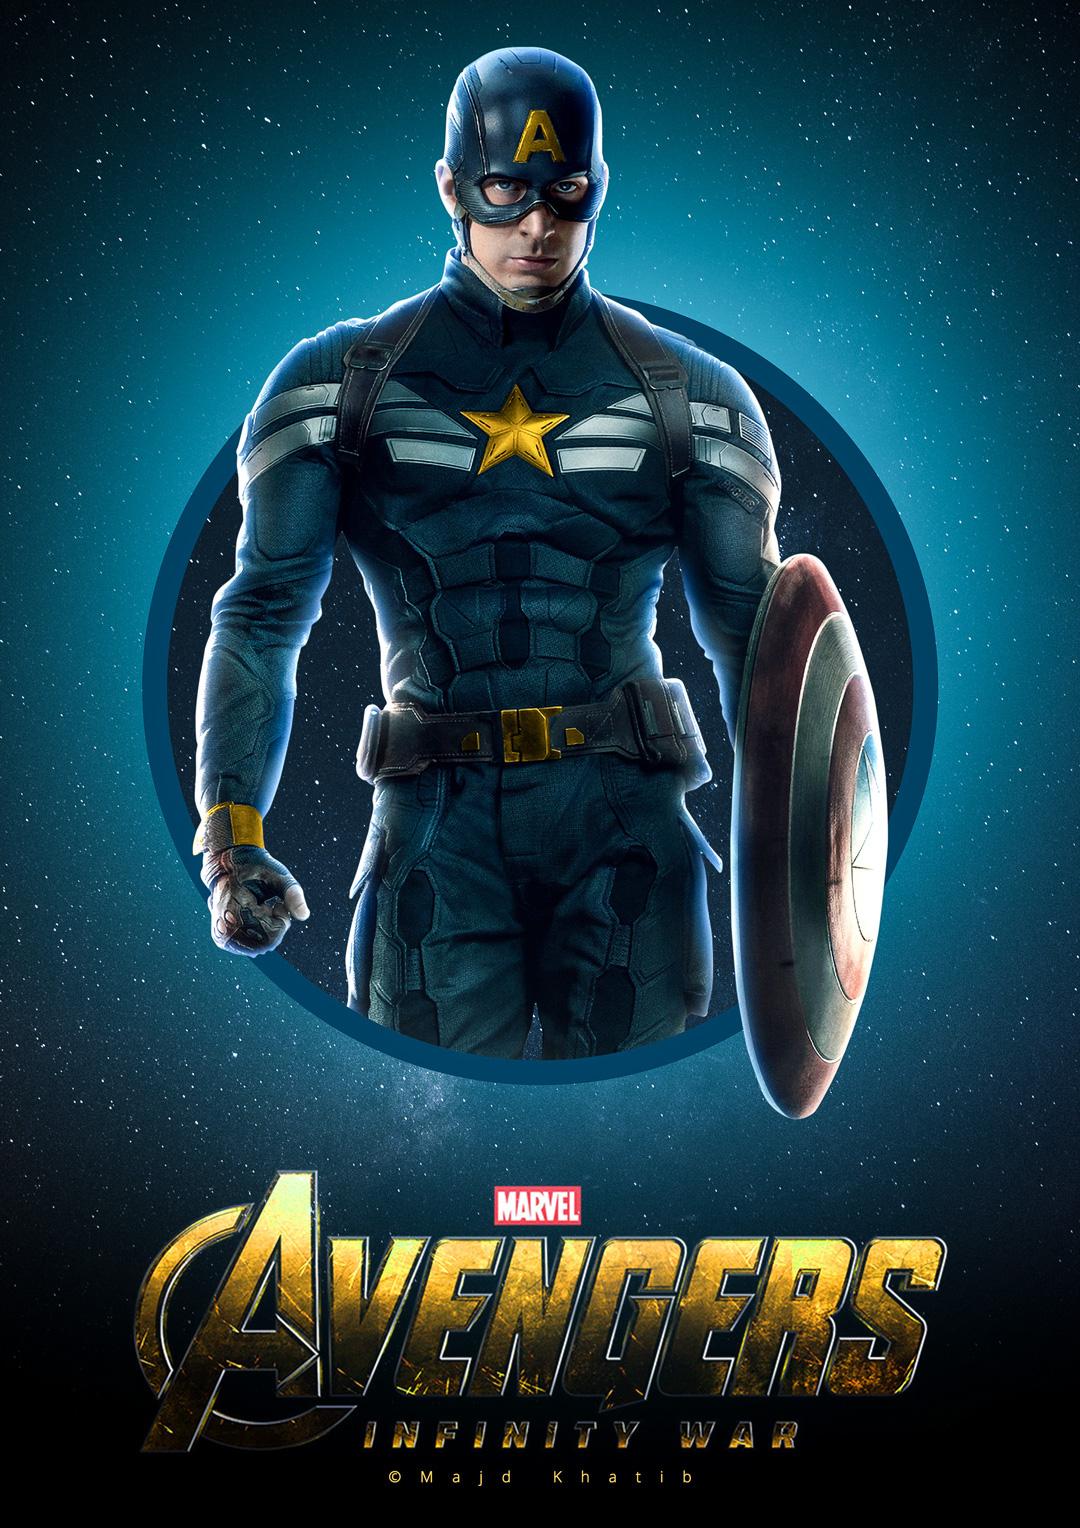 Avengers Infinity War 2018 On Behance